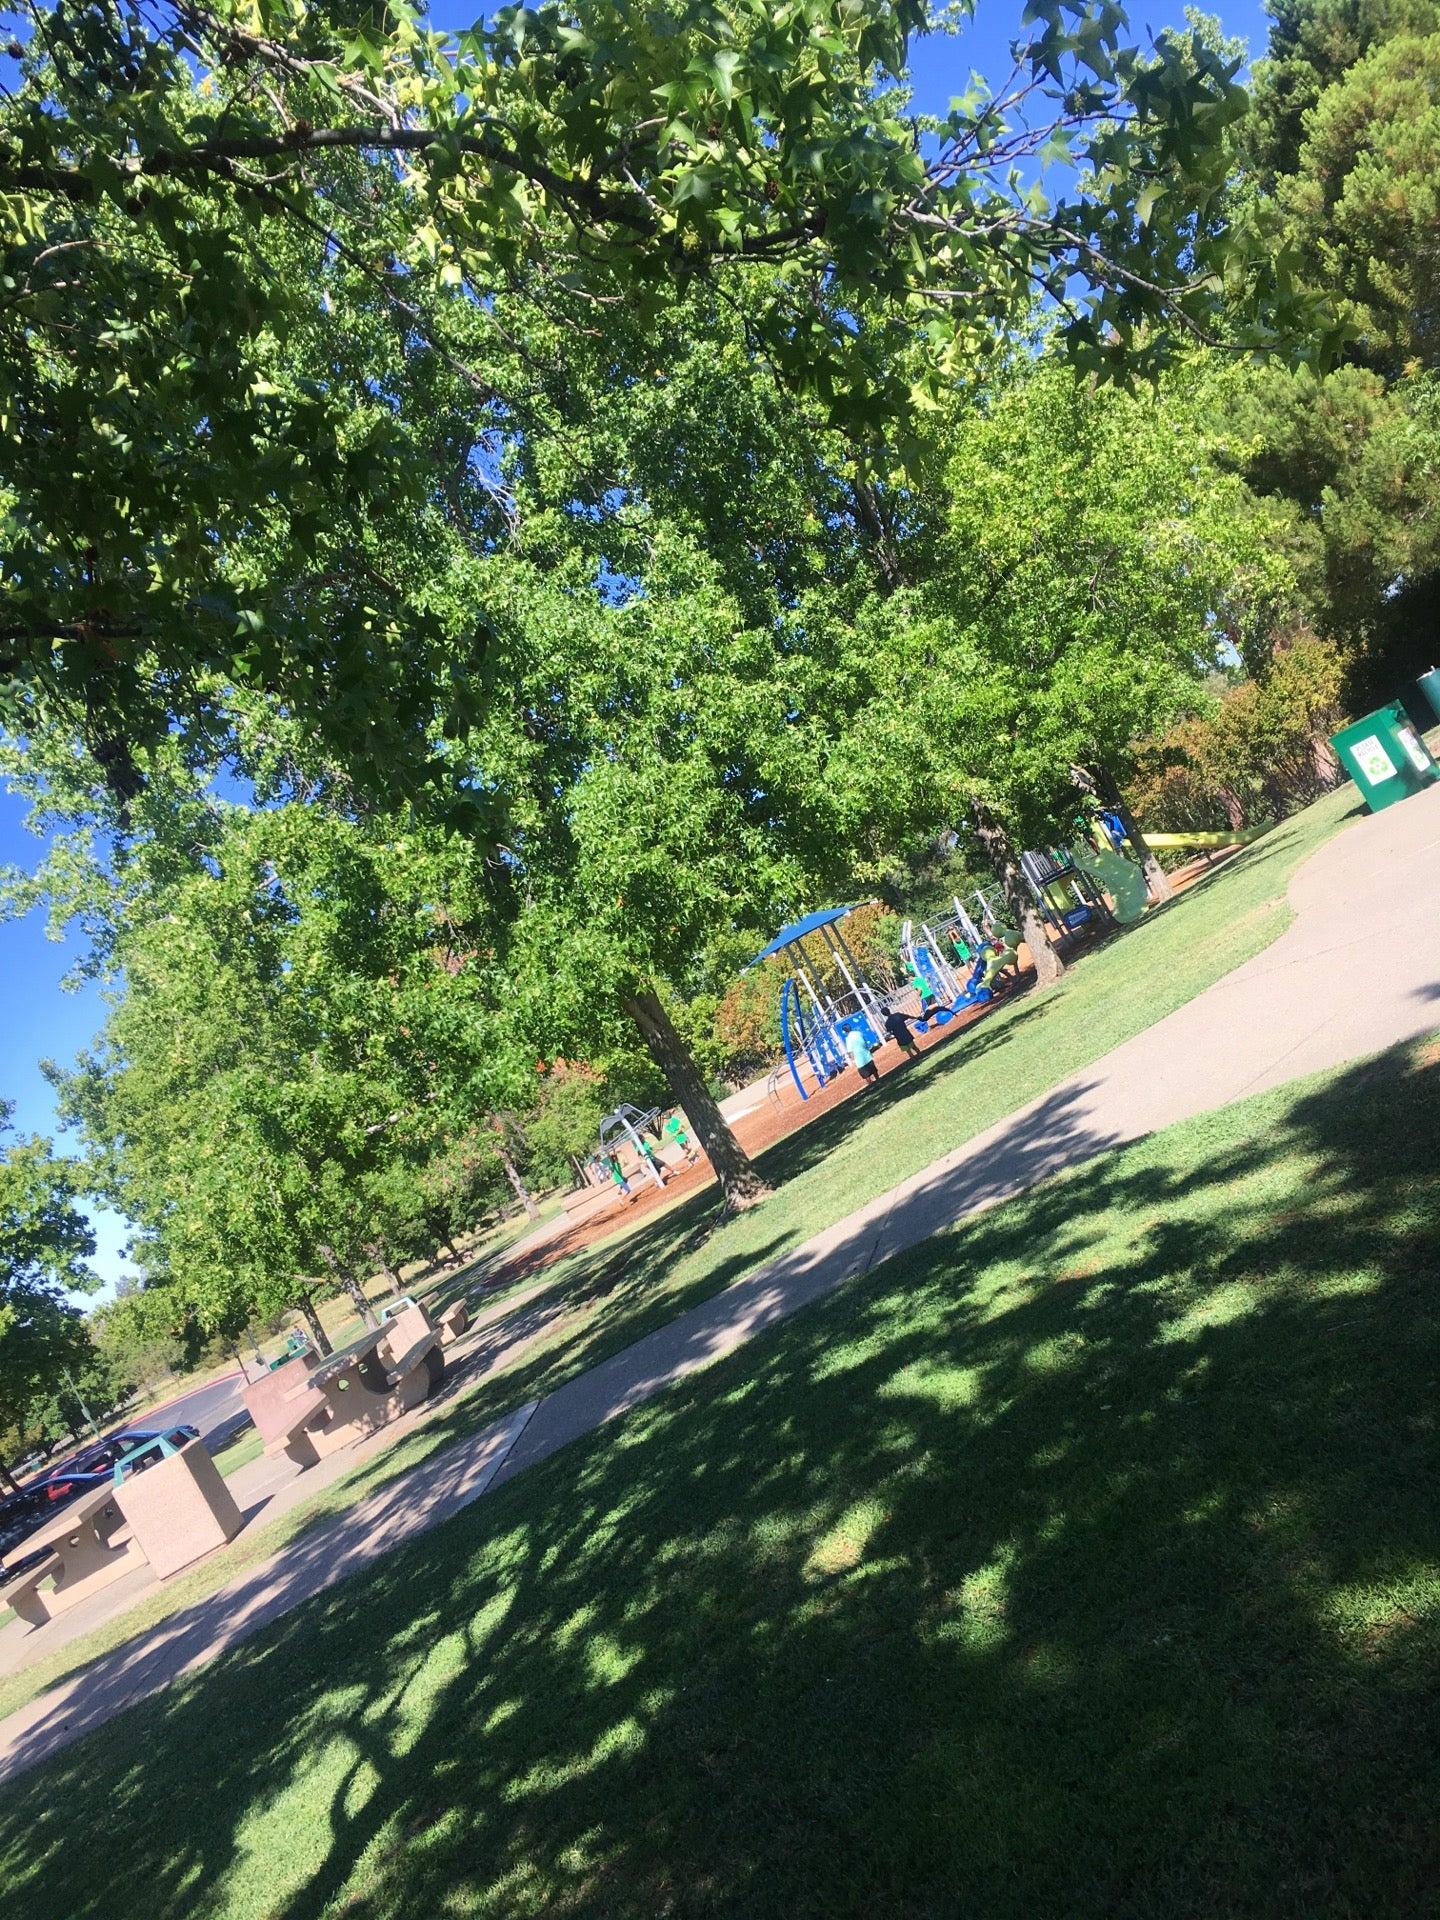 Arbolado Park in Walnut Creek - Parent Reviews on Winnie